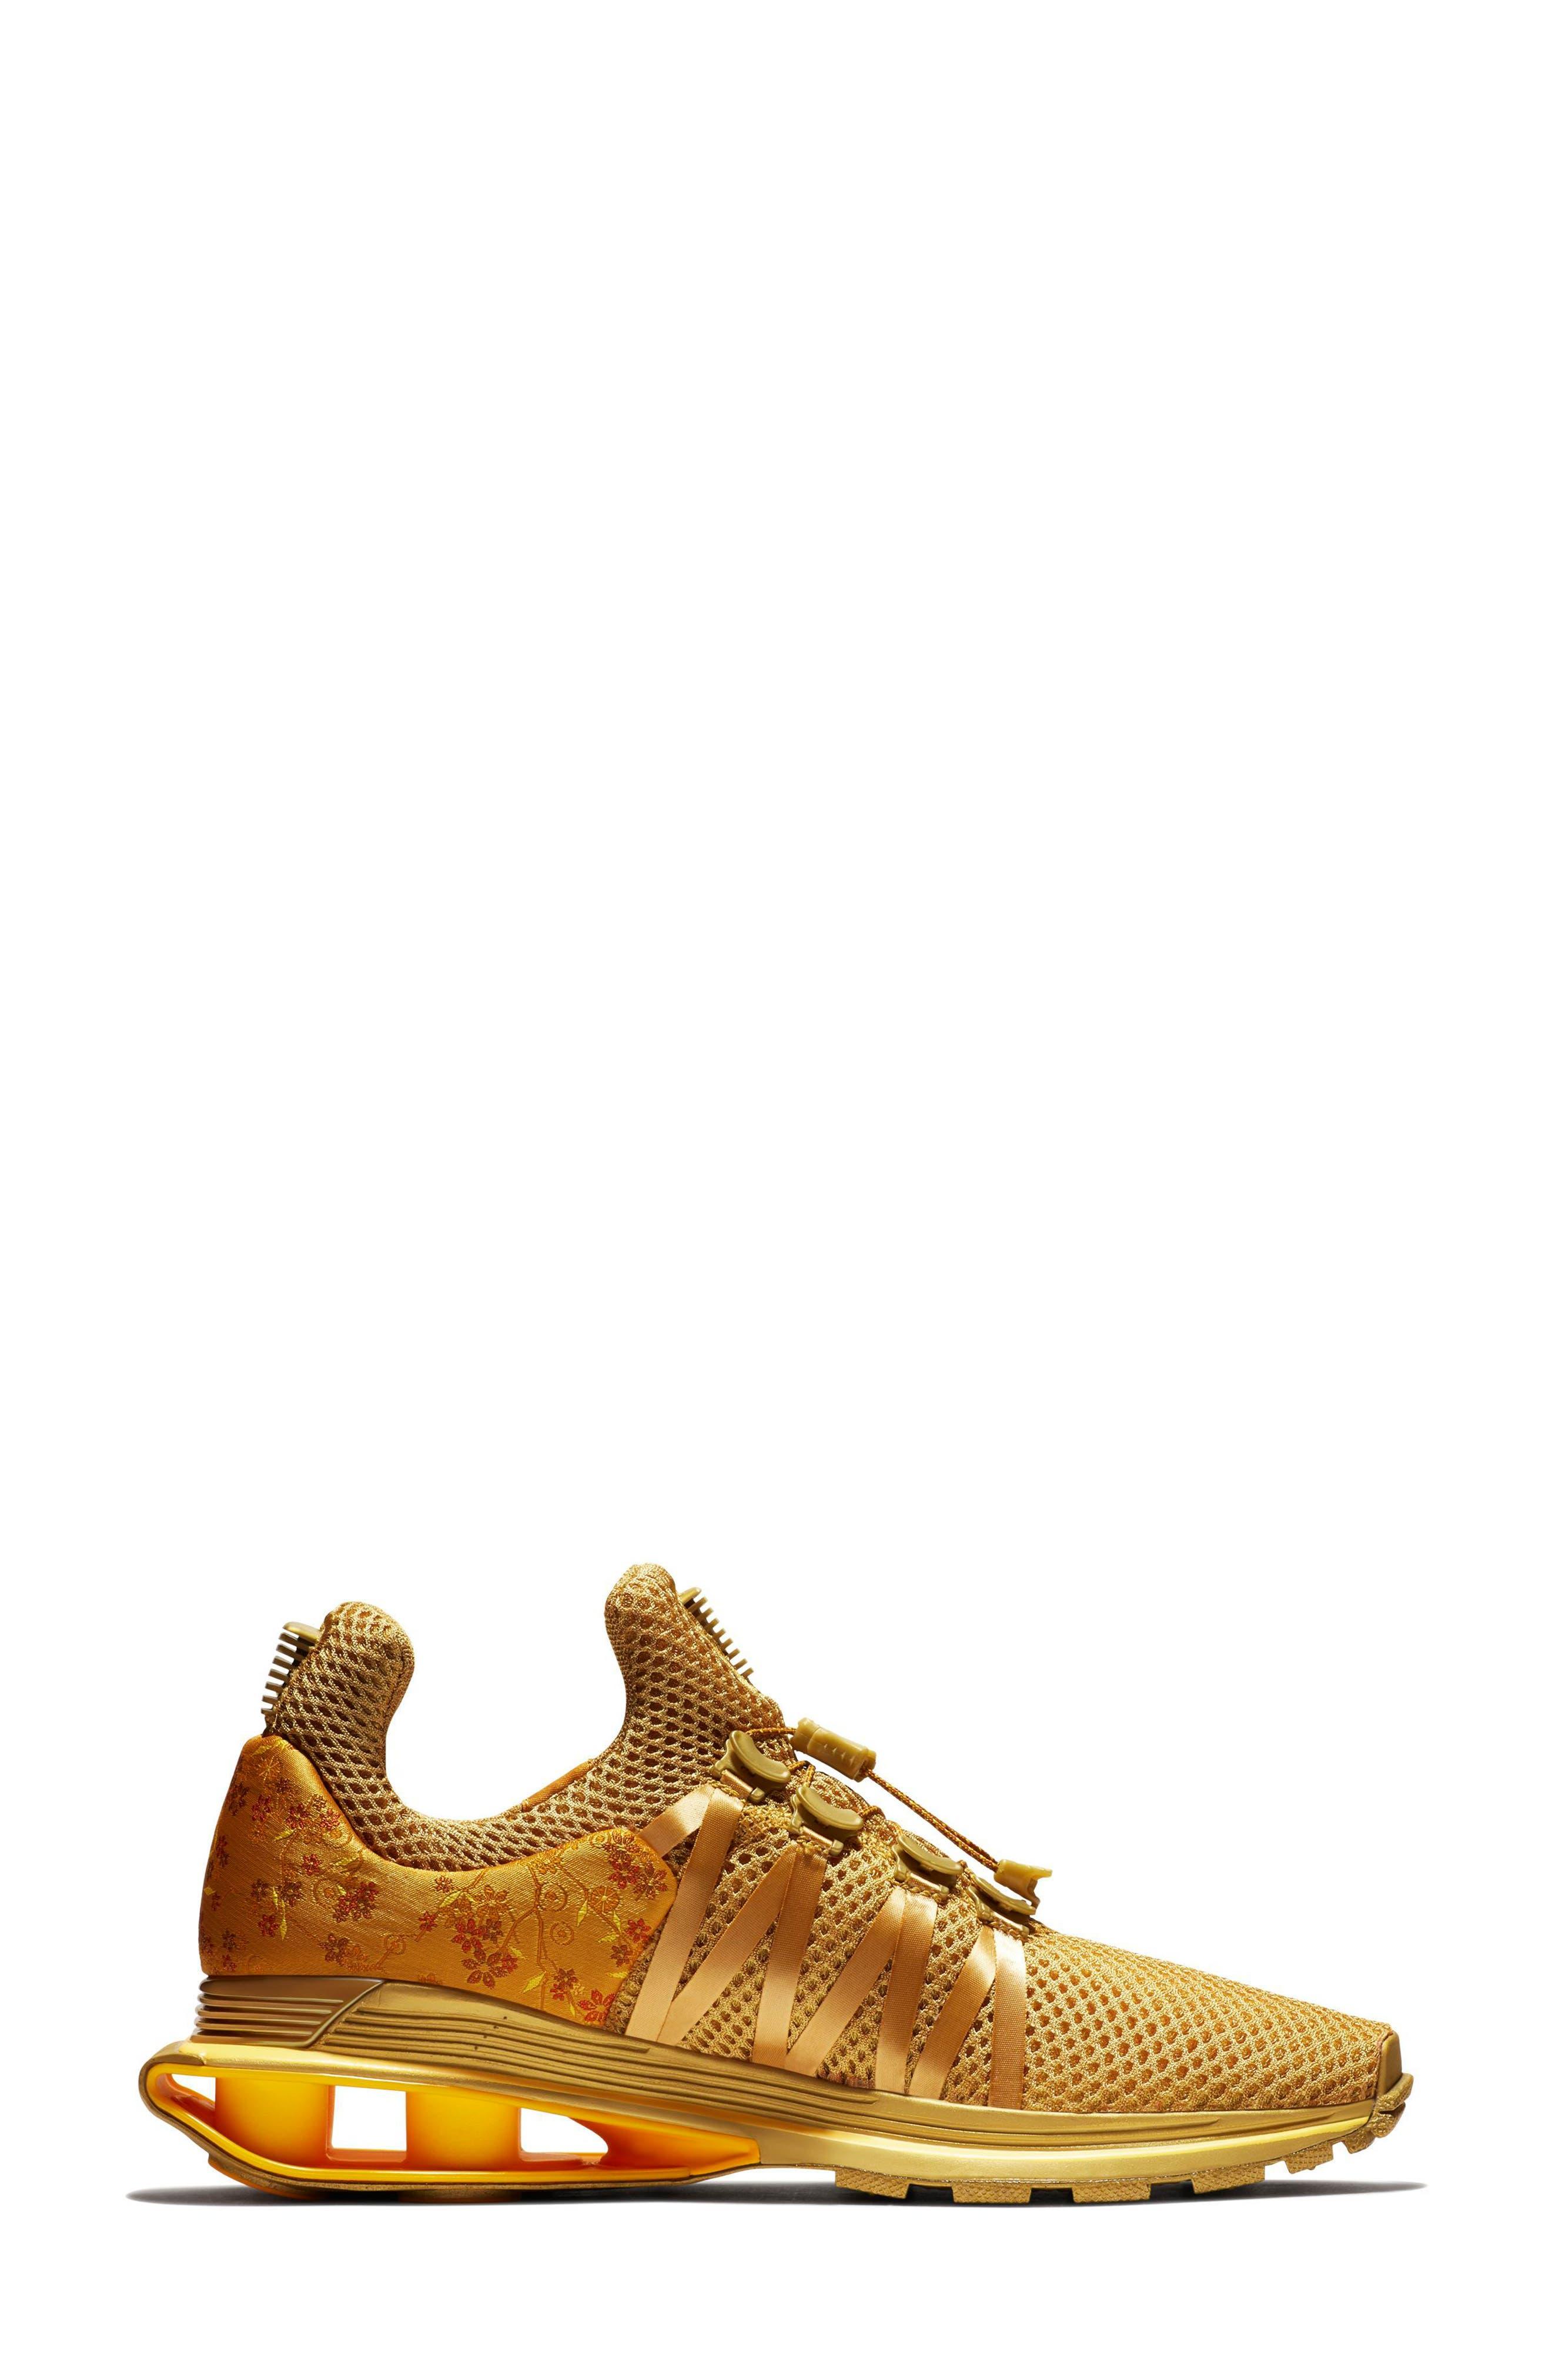 Shox Gravity Sneaker,                             Alternate thumbnail 9, color,